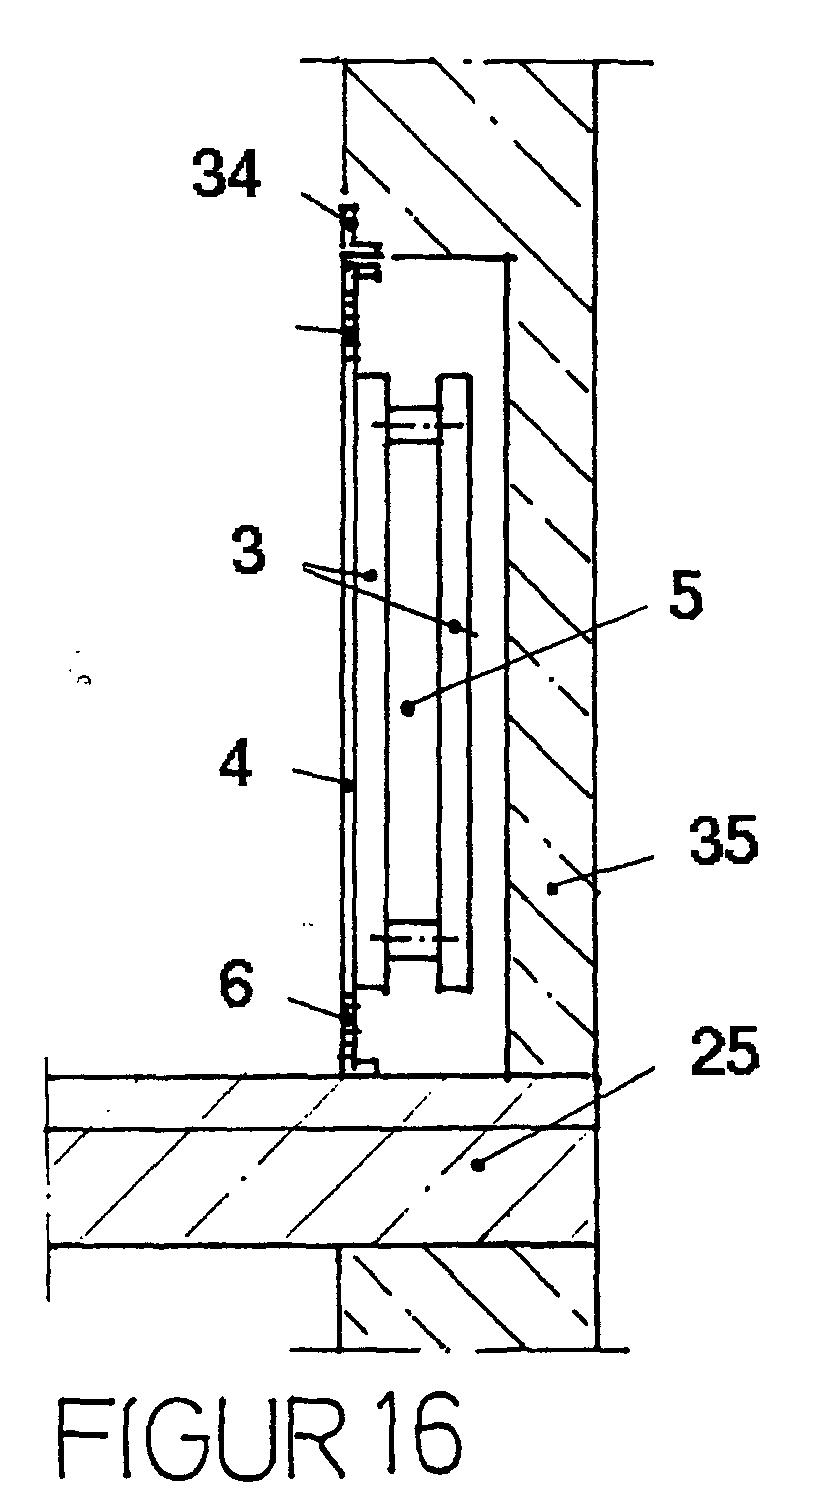 patent ep1139031a2 innenraum klimatisierungsvorrichtung google patents. Black Bedroom Furniture Sets. Home Design Ideas